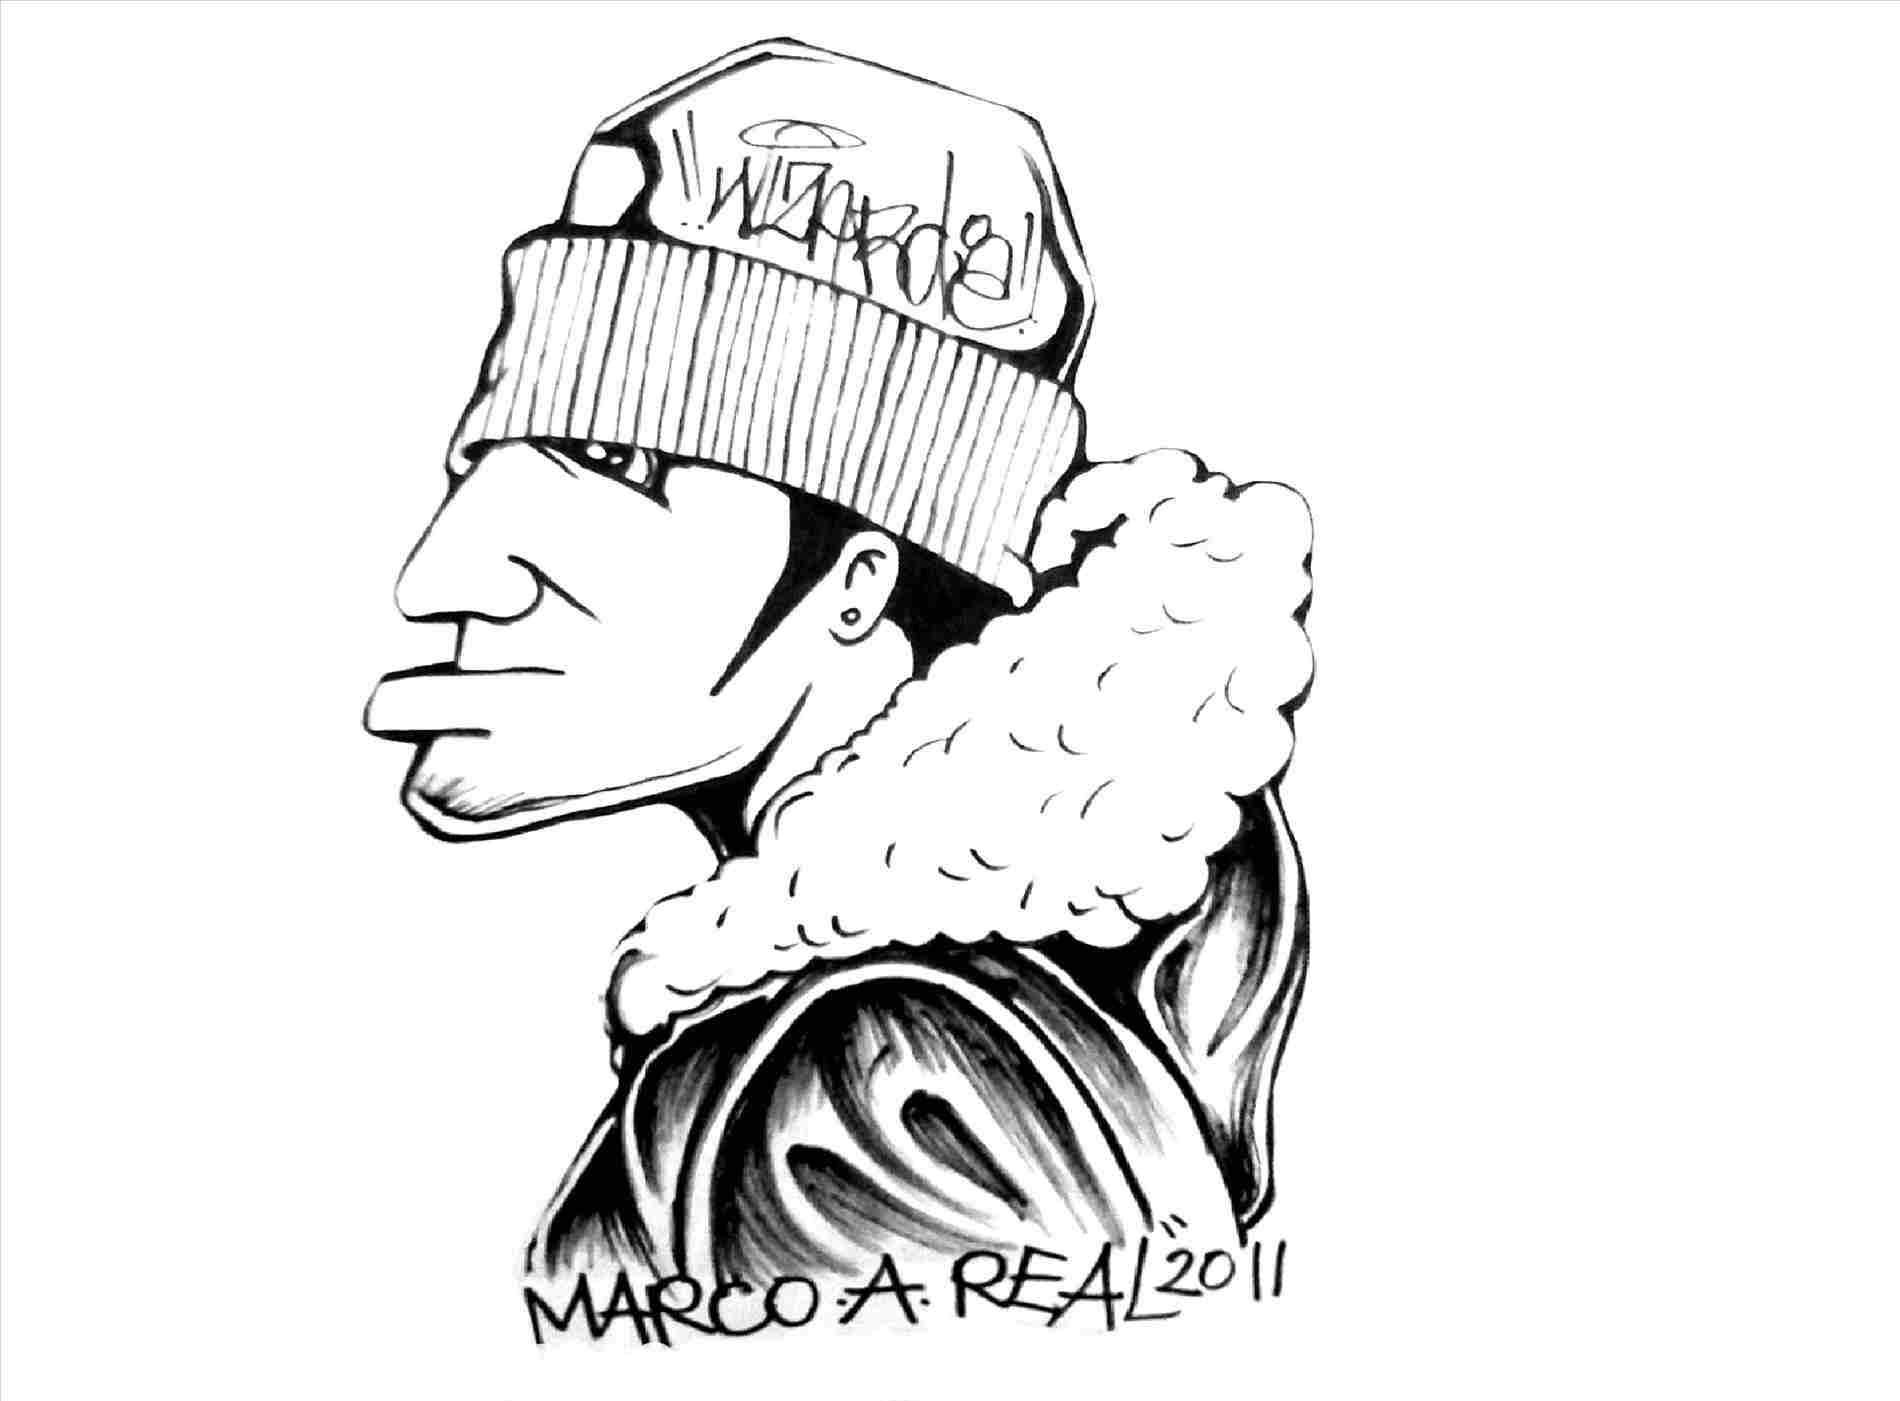 1900x1401 Awesome Cartoons To Draw Cartoon Thug Drawings Drawing A Gangsta